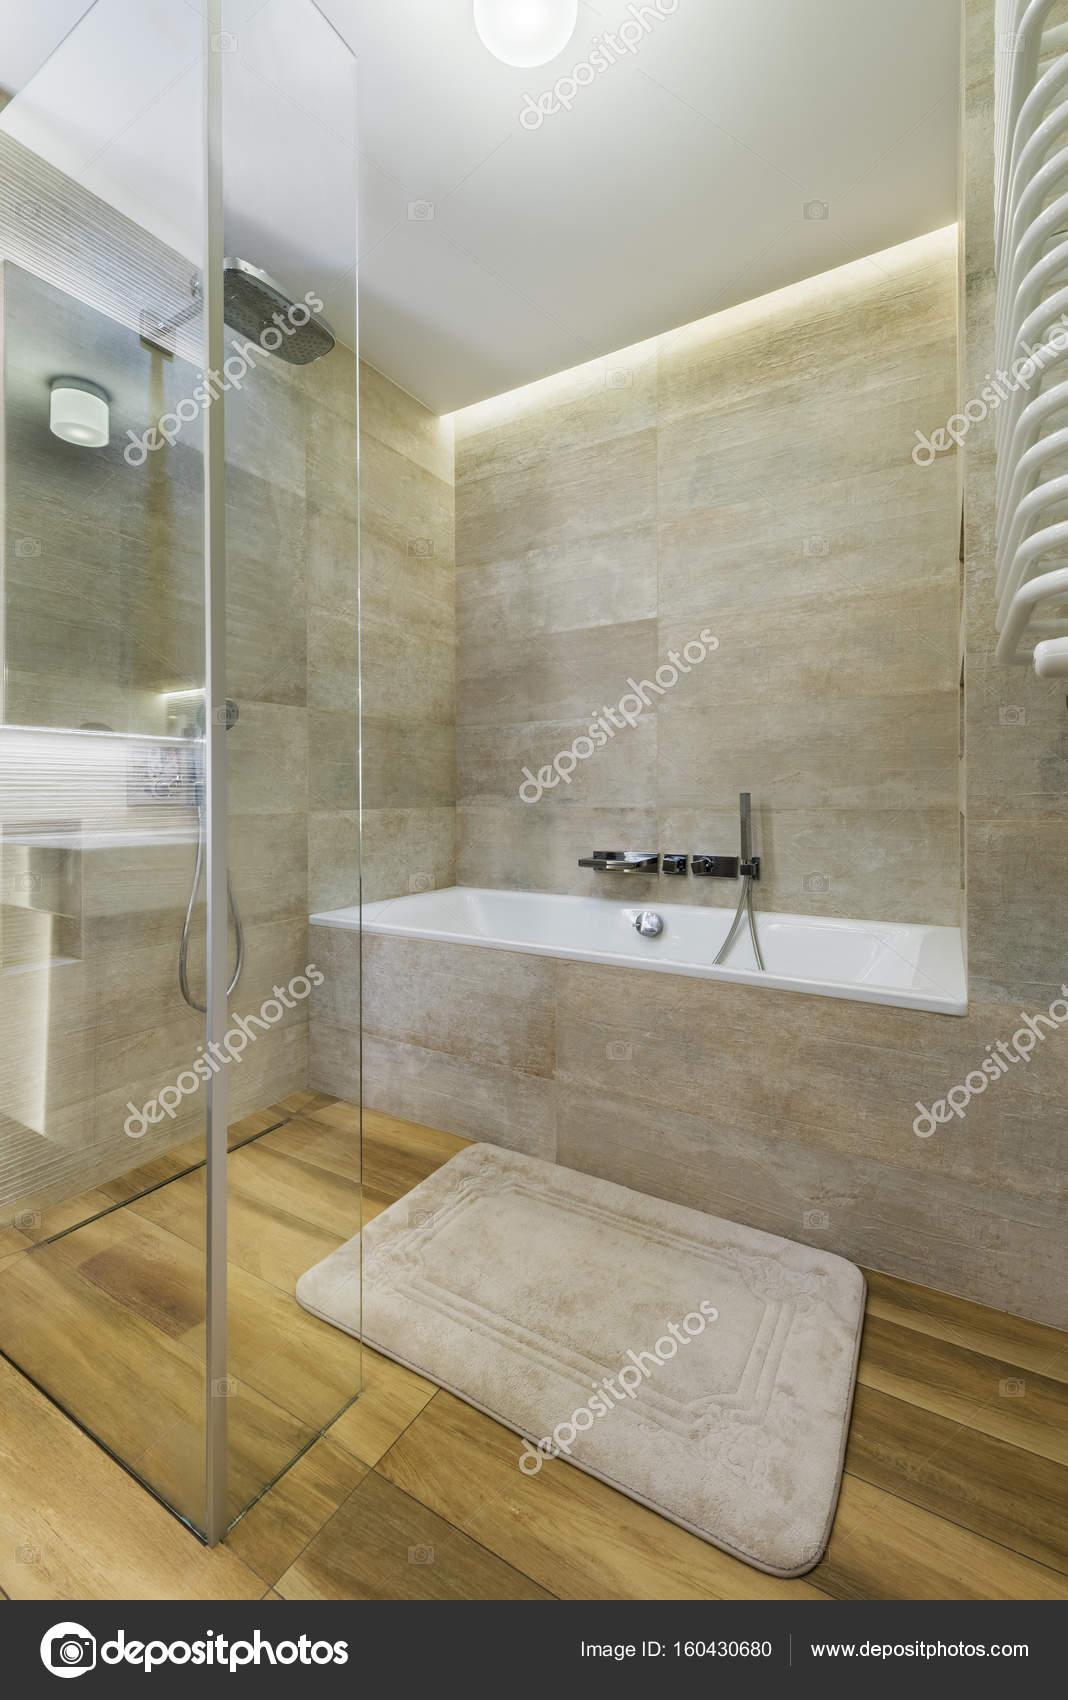 Moderne Badezimmer Mit Holzboden Stockfoto C Jacek Kadaj 160430680